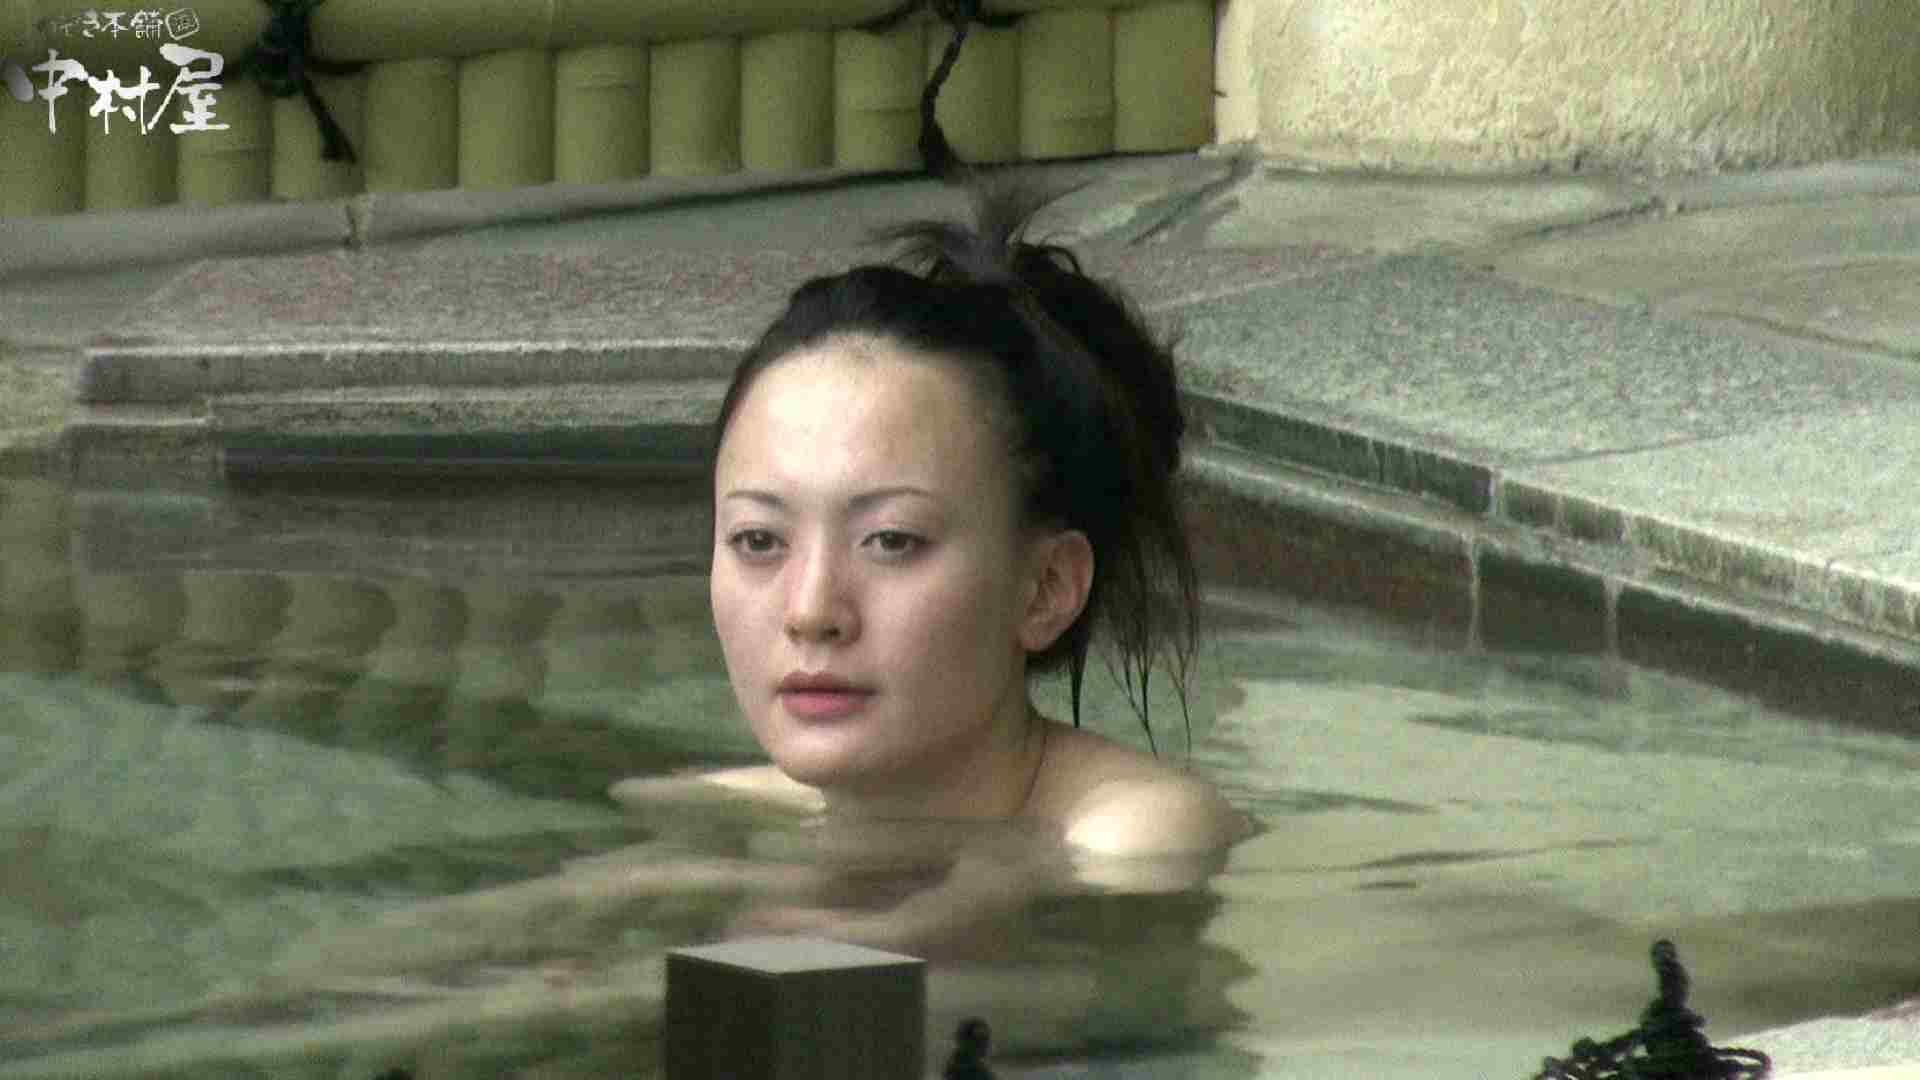 Aquaな露天風呂Vol.900 盗撮師作品 ヌード画像 86pic 53